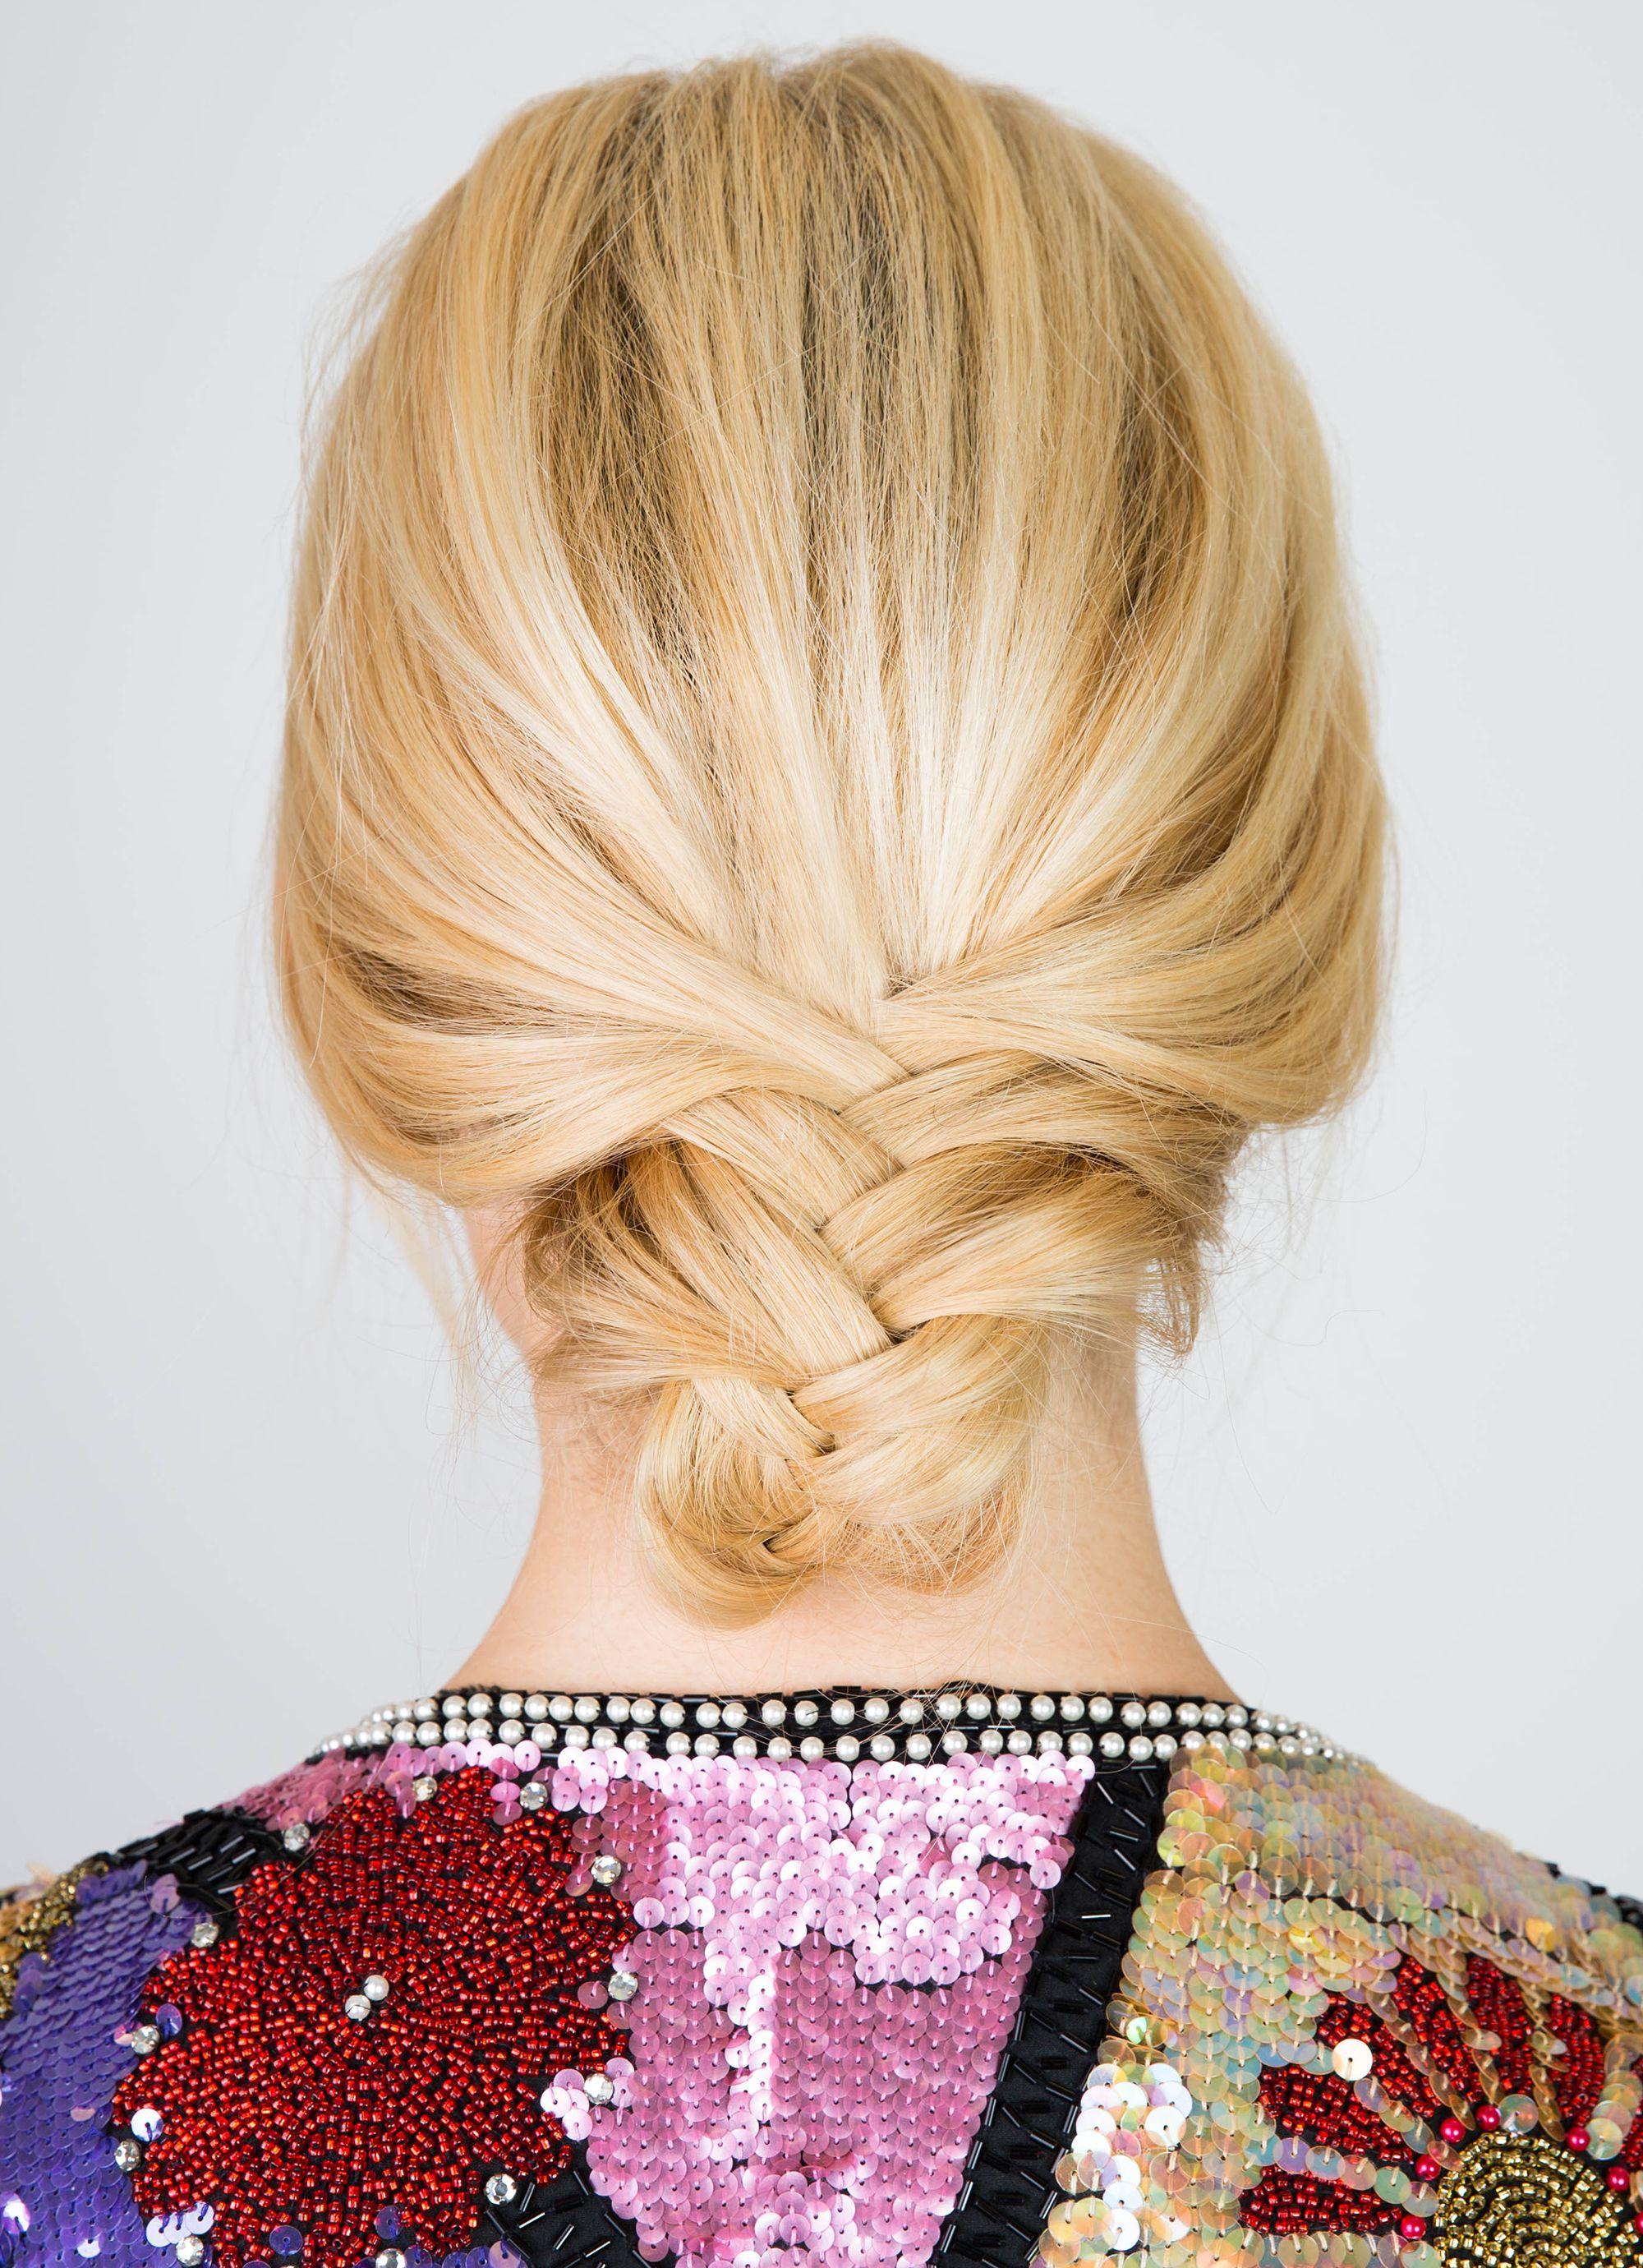 Pleasant Tucked Fishtail Braid Hair How To Gorgeous Tucked Fishtail Braid Natural Hairstyles Runnerswayorg